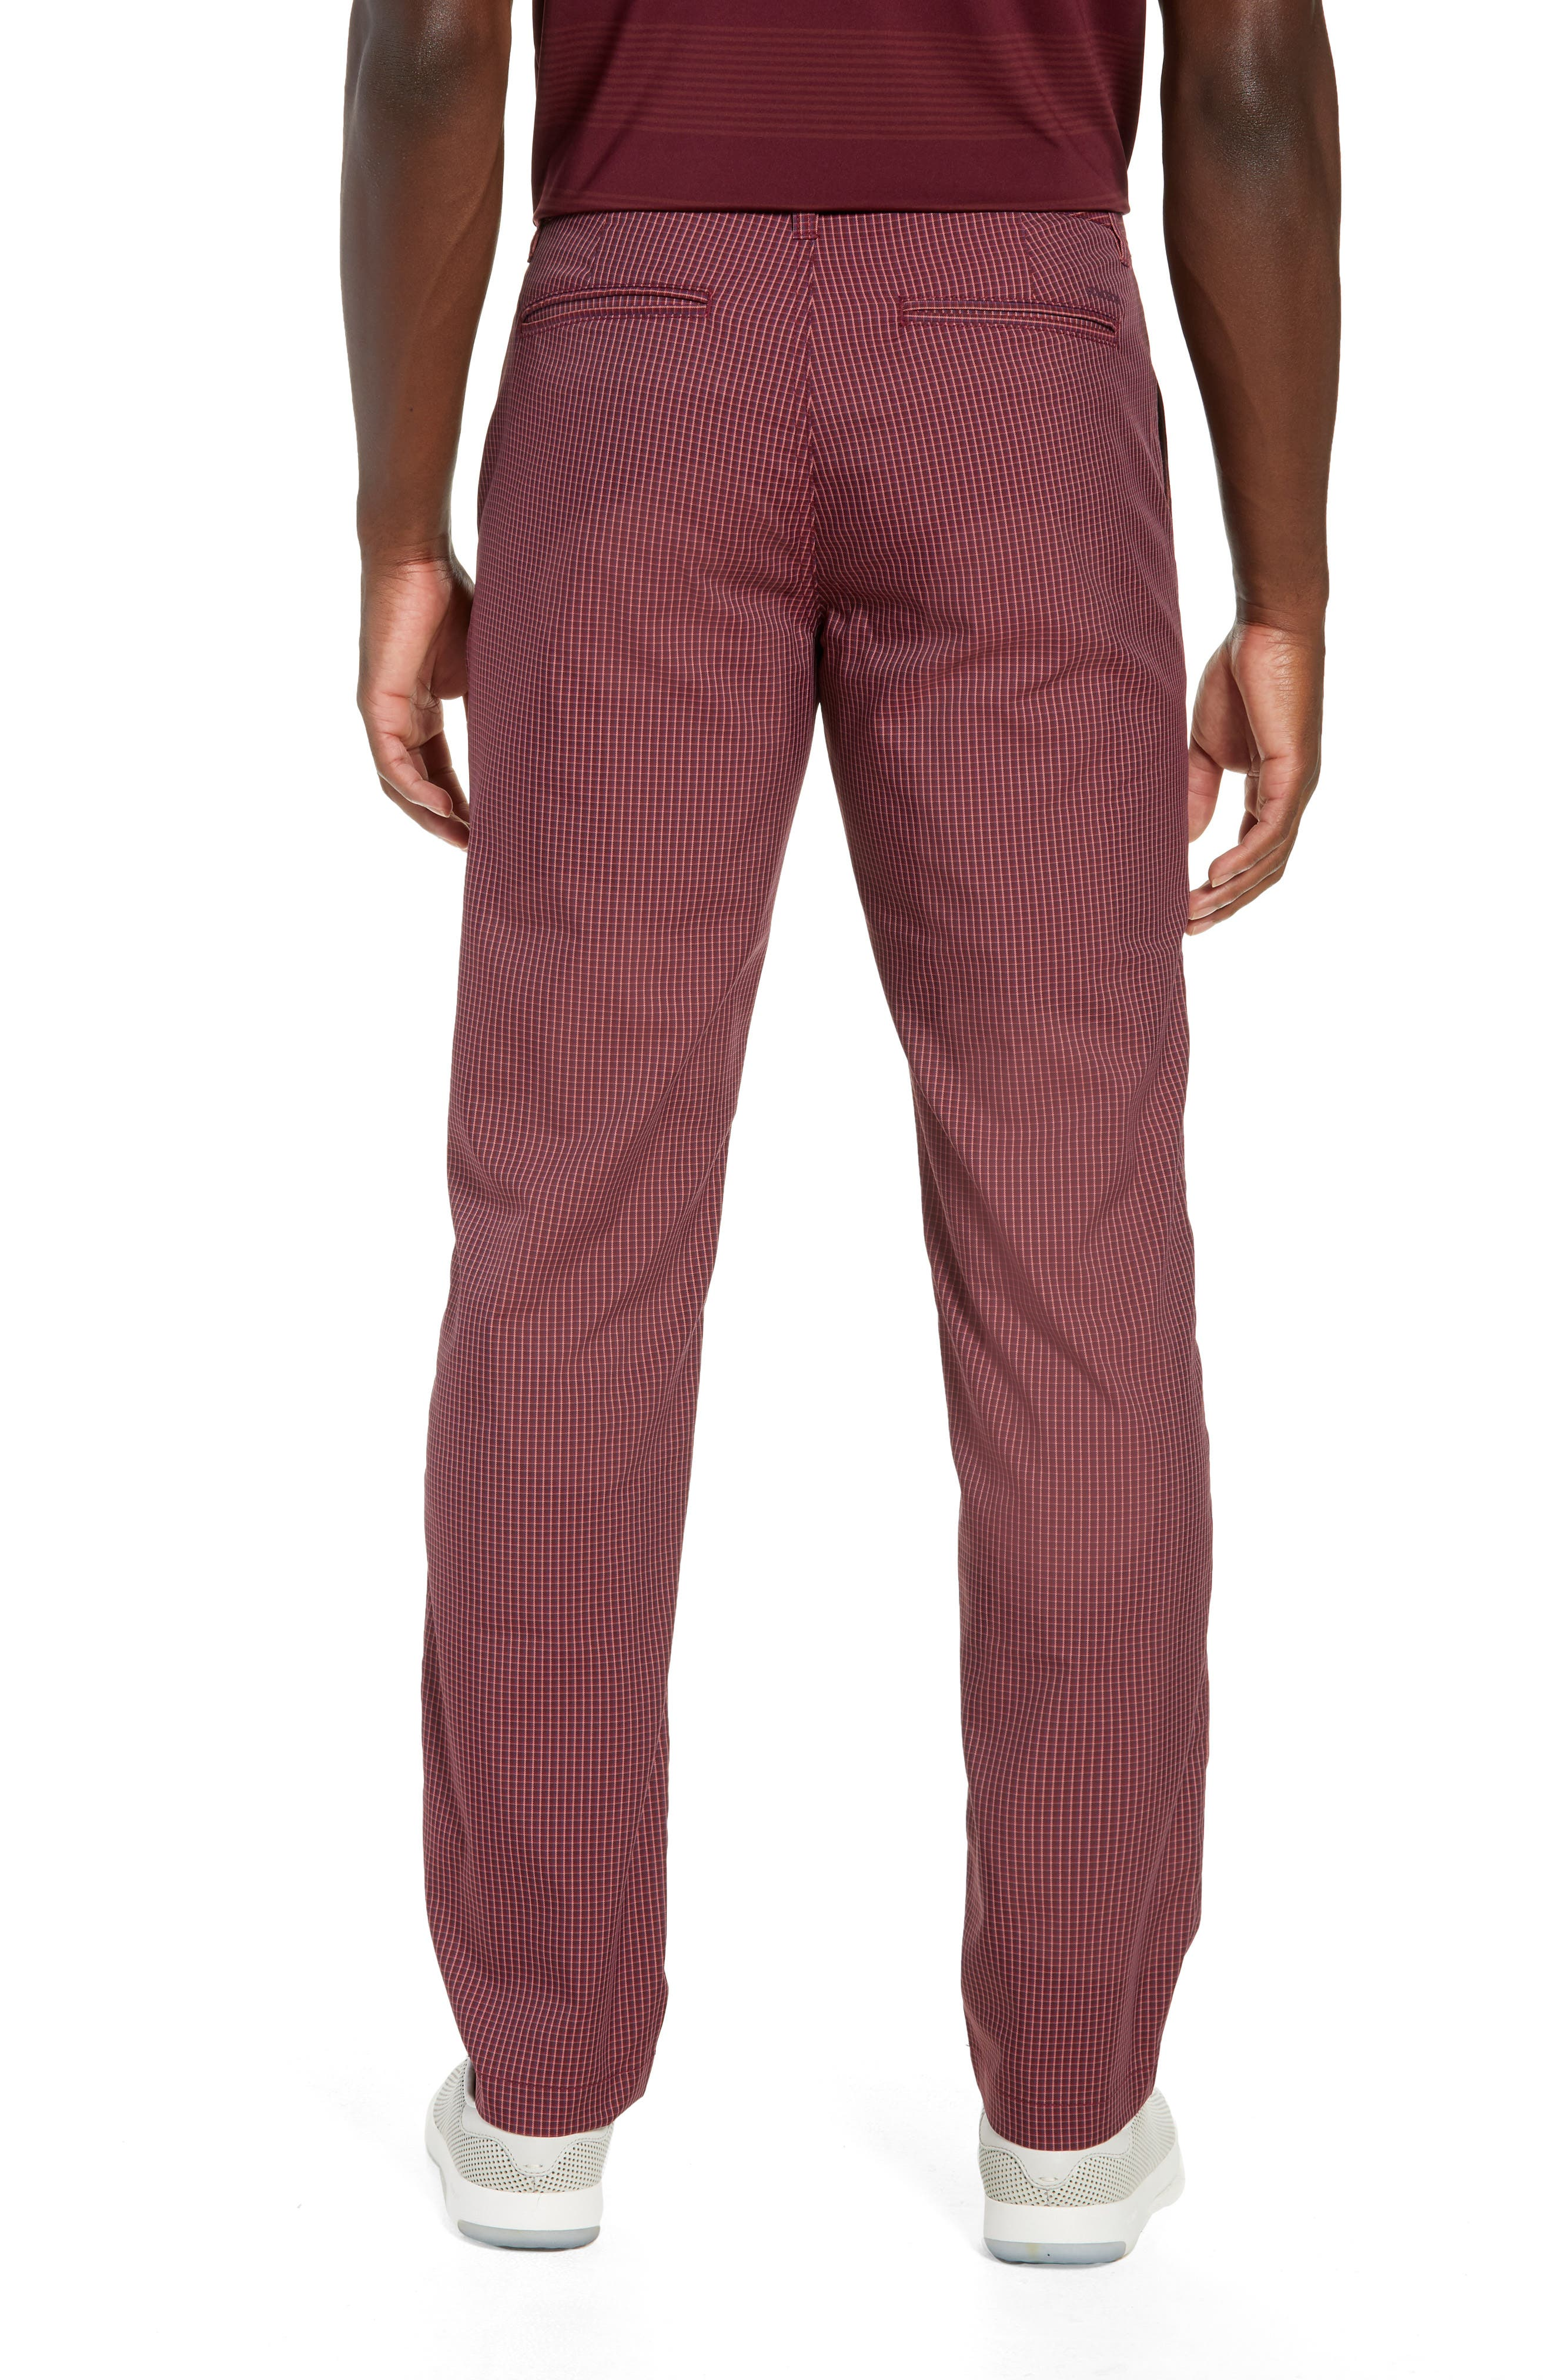 Highland Slim Fit Golf Pants,                             Alternate thumbnail 2, color,                             RED PLAID